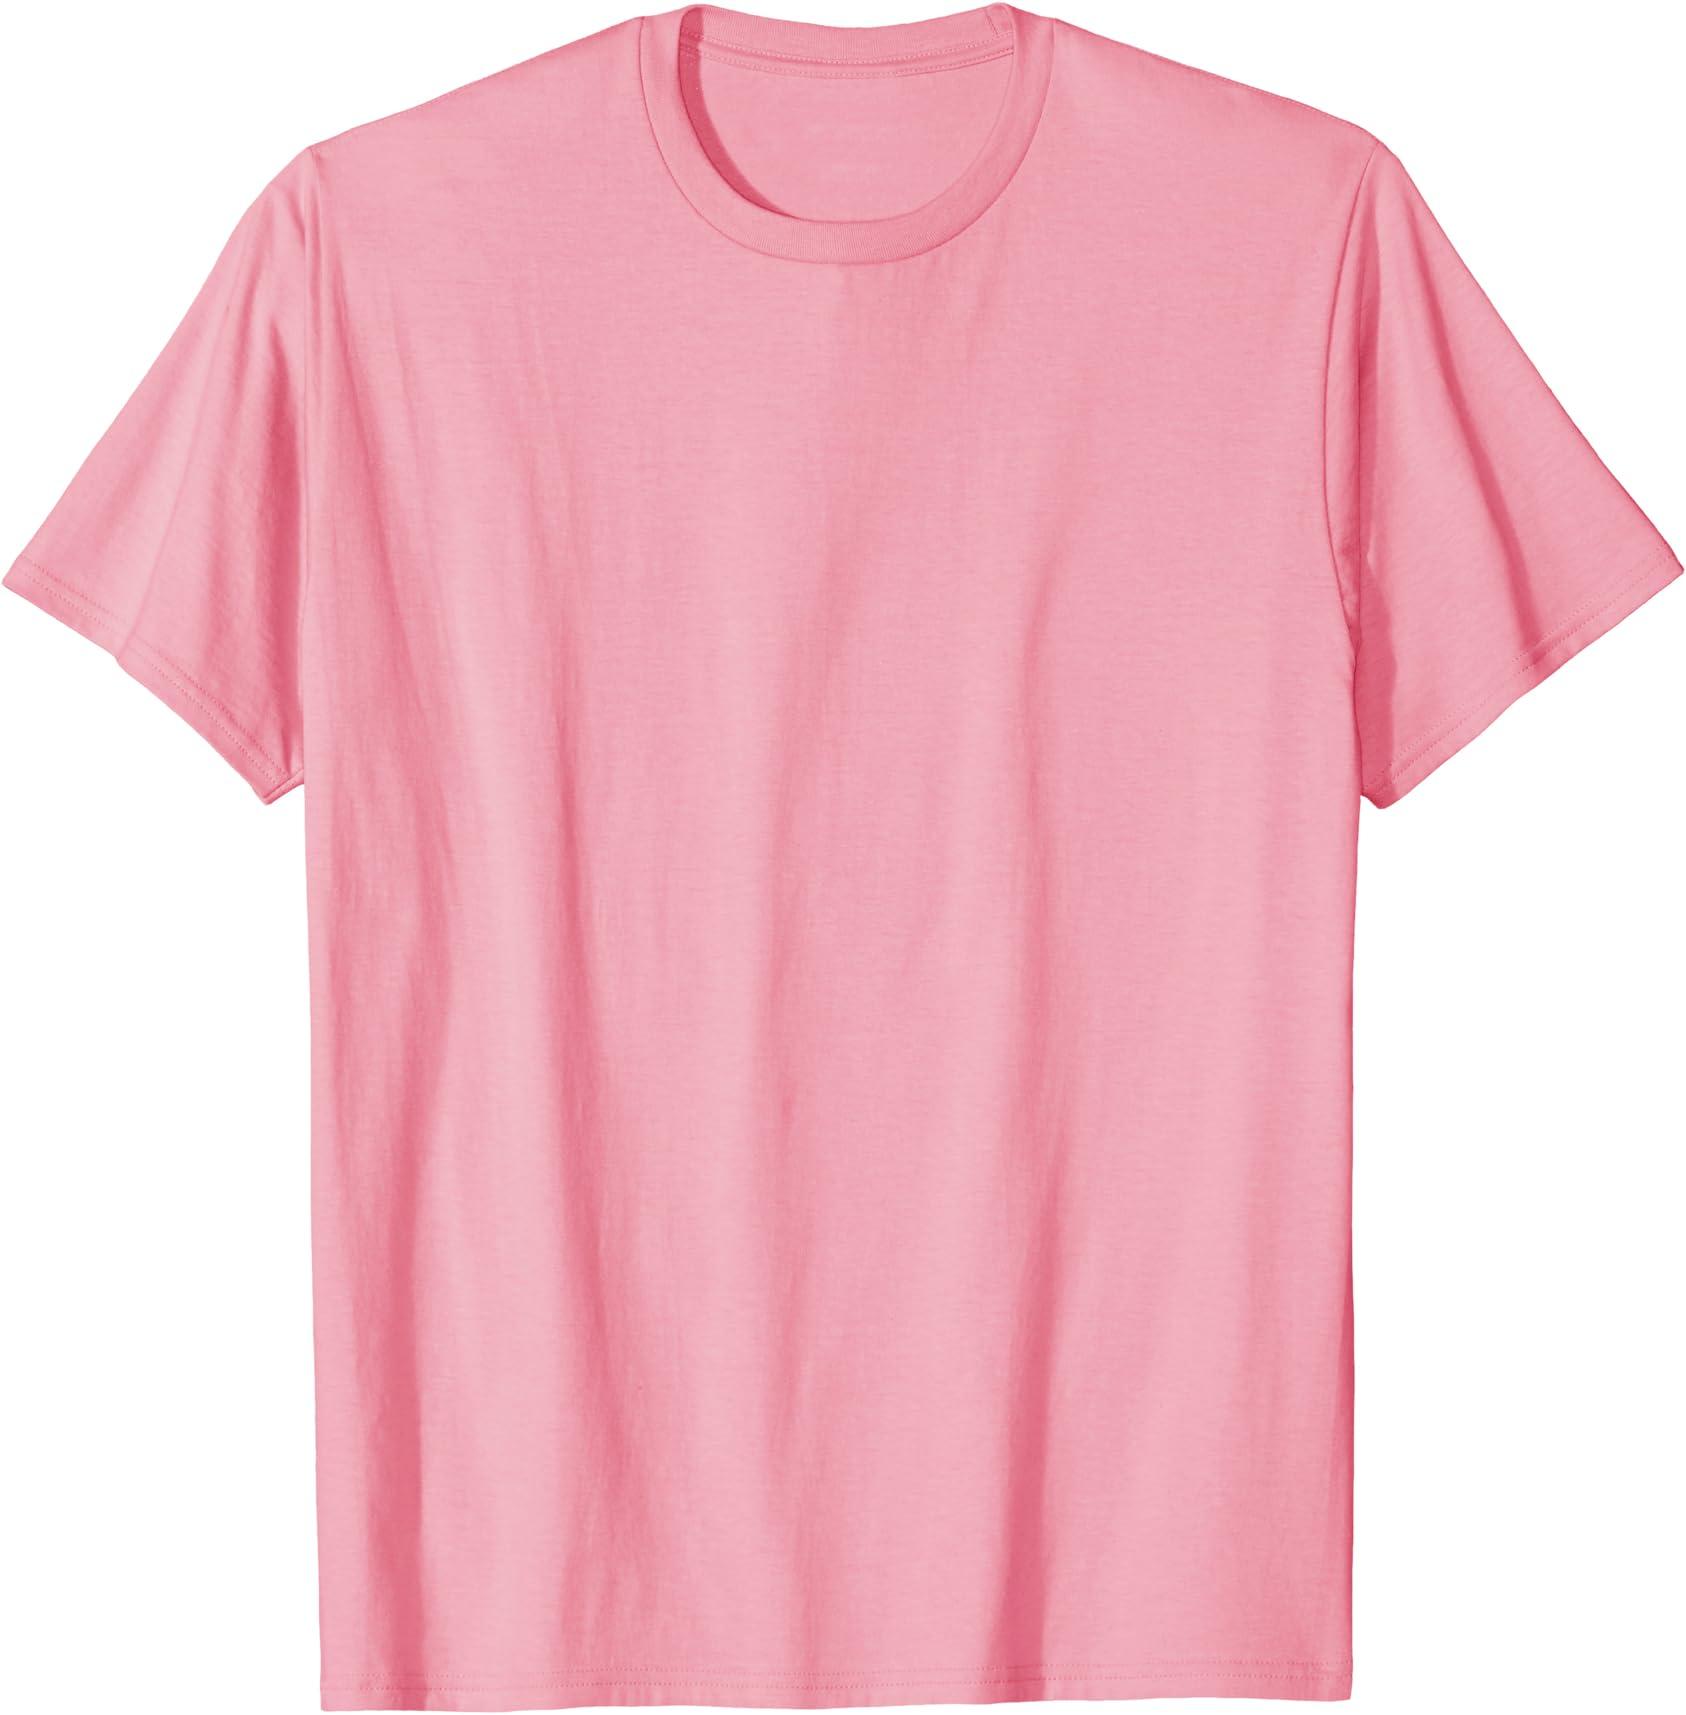 Shop4Ever Tough Guys Wear Pink Youths T-Shirt Breast Cancer Awareness Shirts